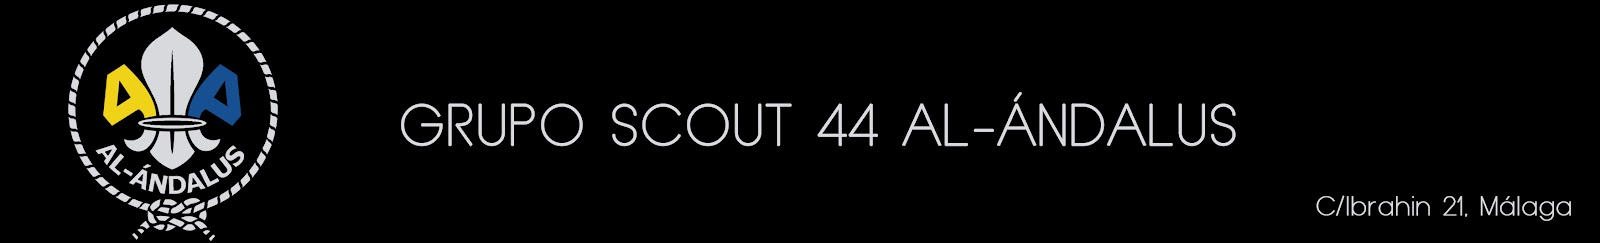 Grupo scout 44 Al-Andalus